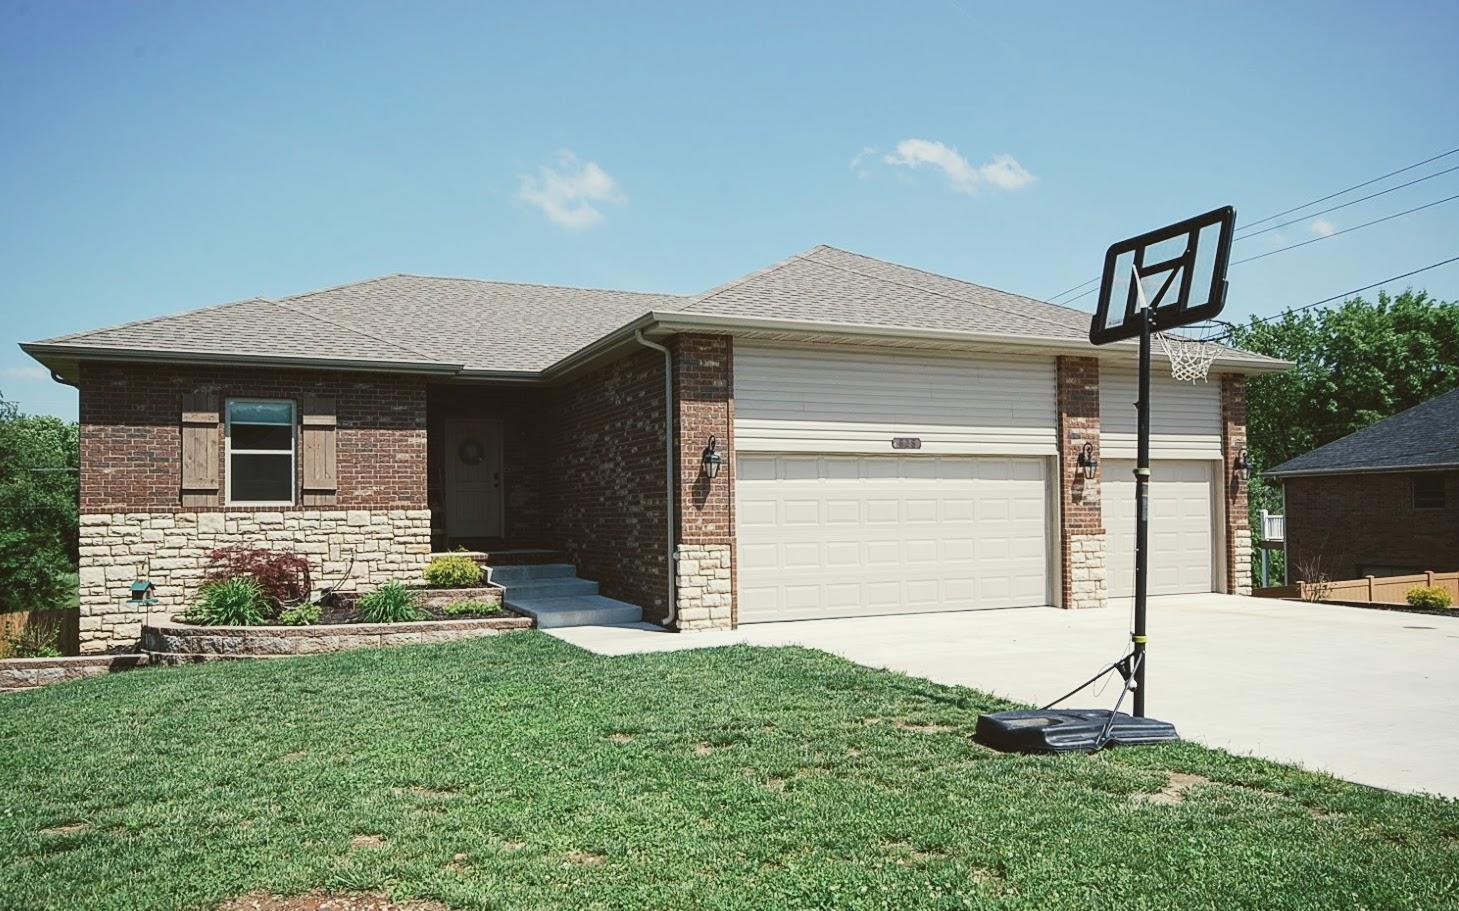 828 Mark Street Willard, MO 65781